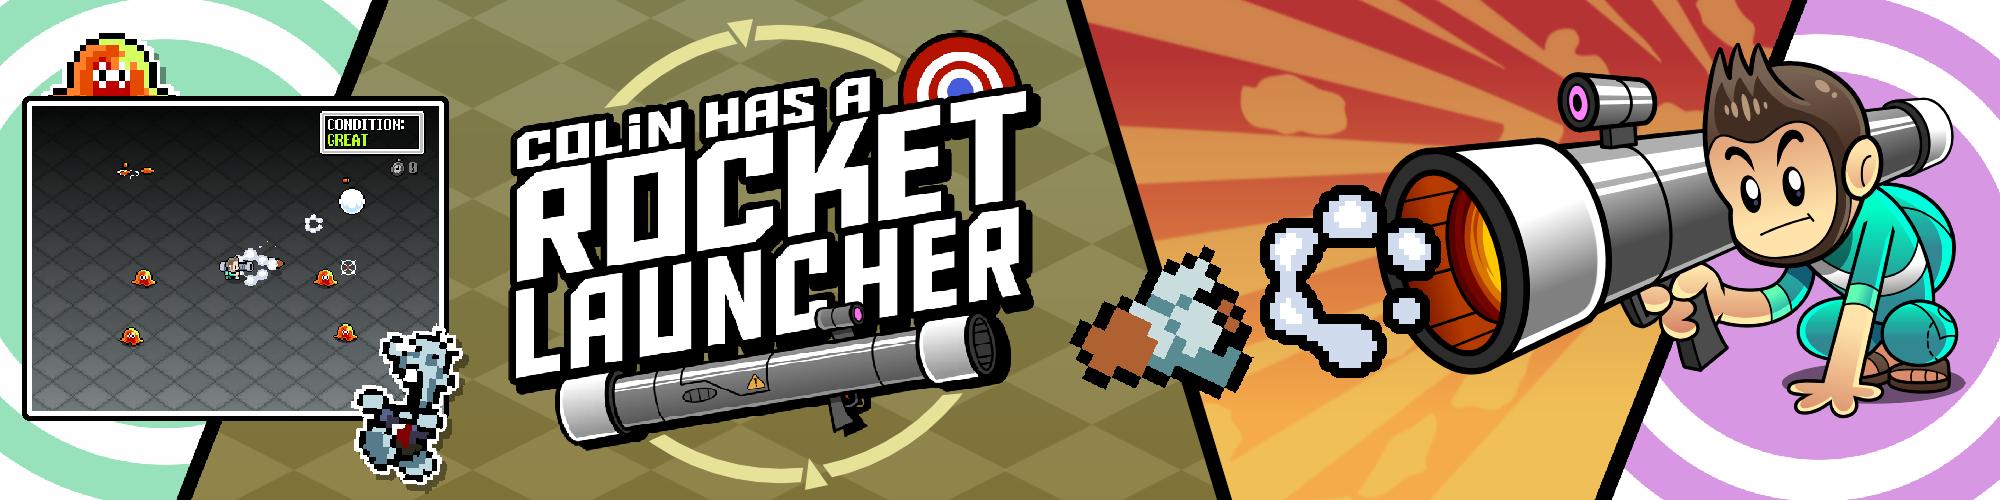 Colin Has A Rocket Launcher